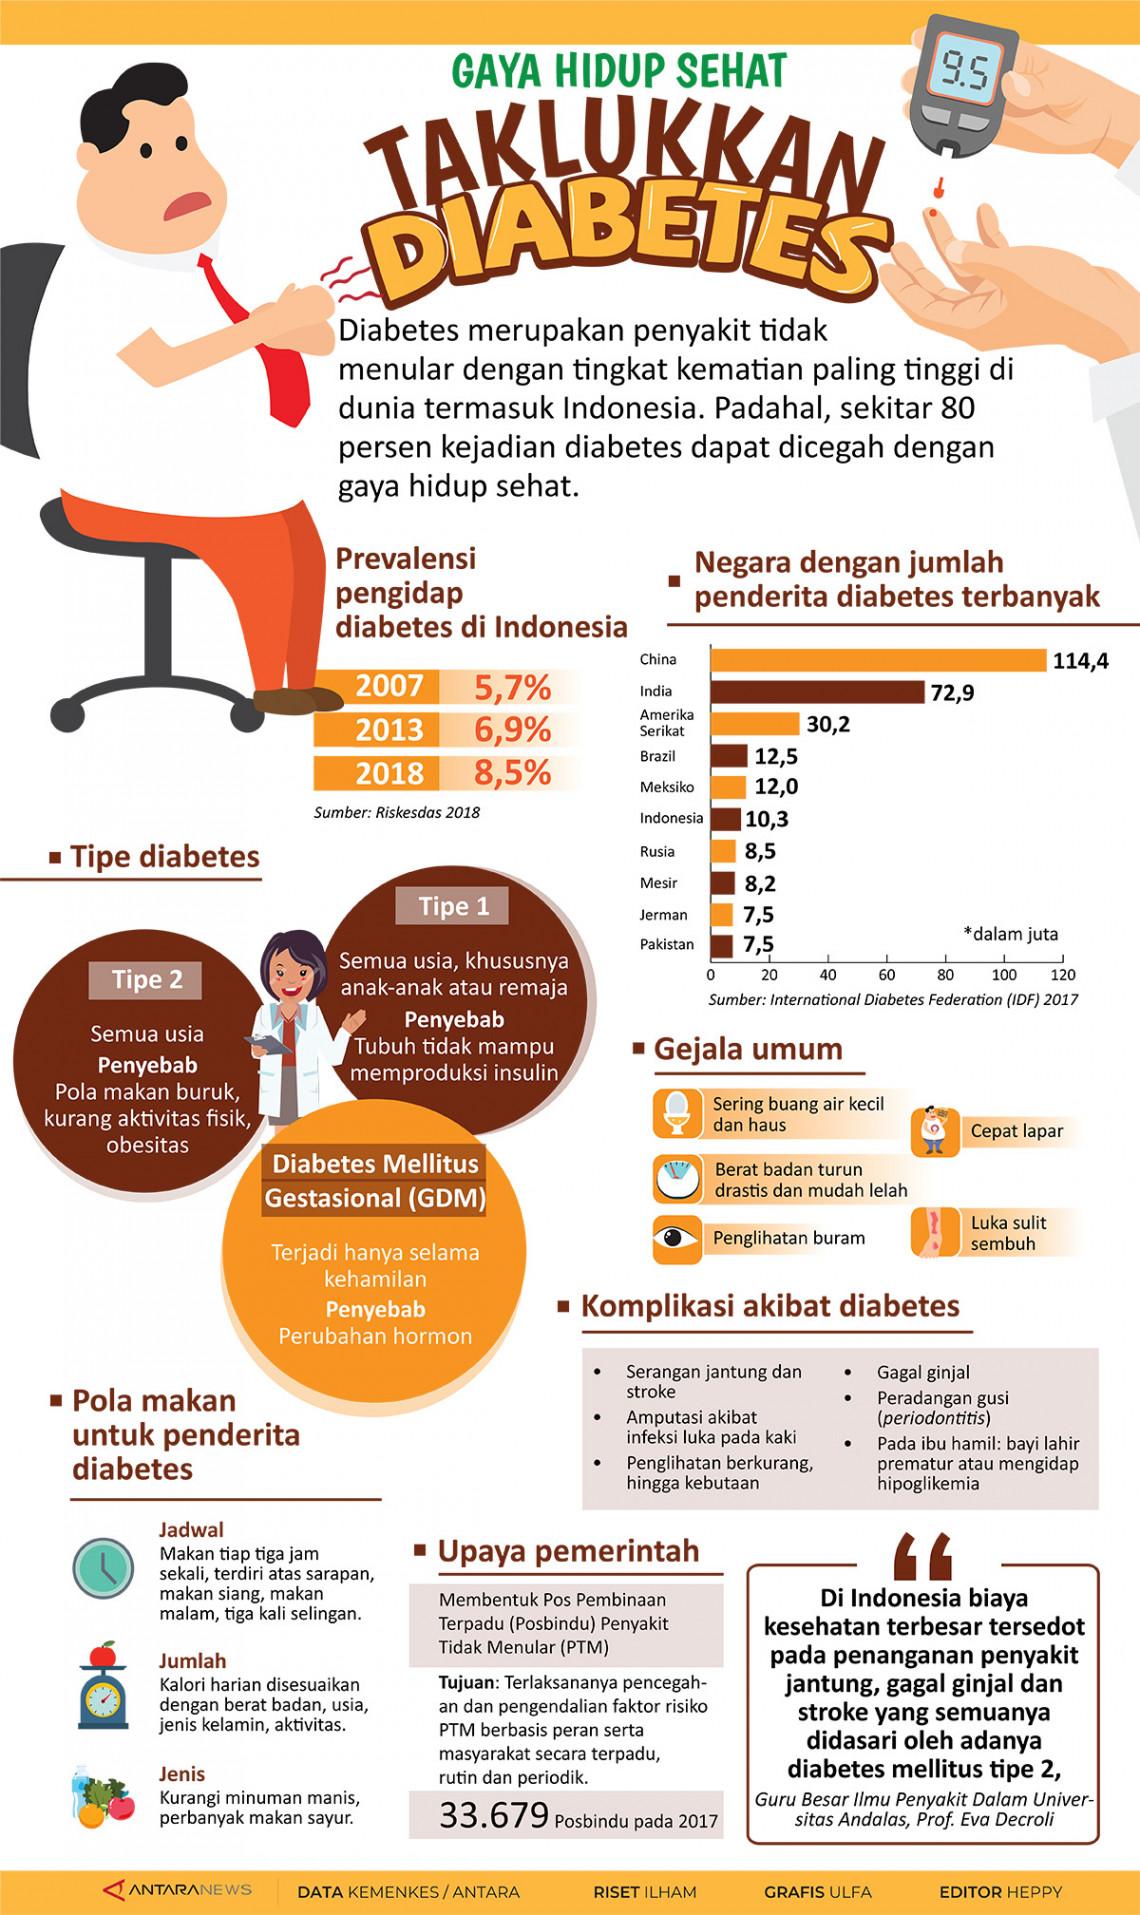 Gaya hidup sehat taklukkan diabetes